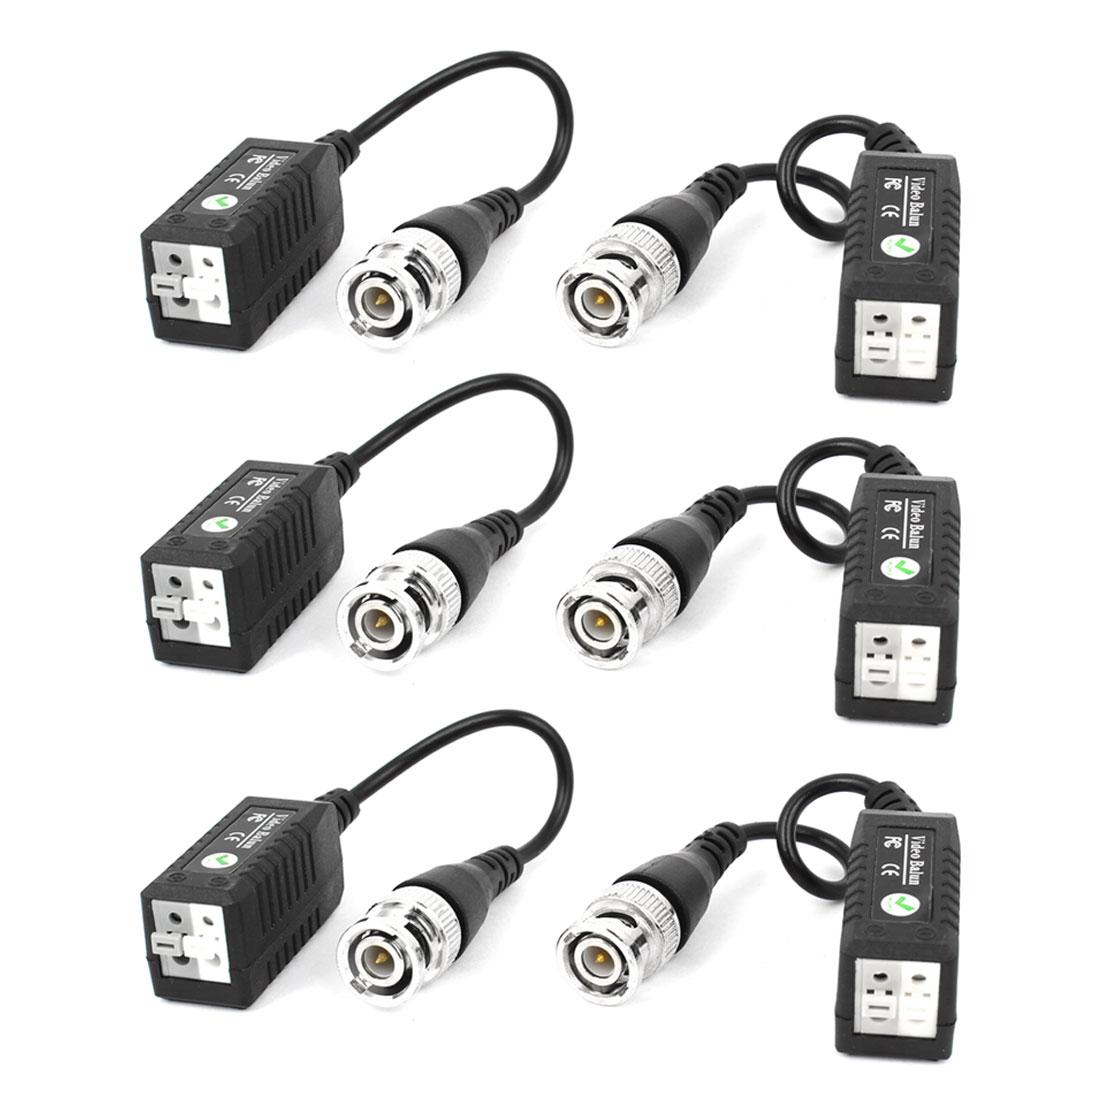 6 Pcs Cat5 Coaxial Cable BNC UTP Passive Video Balun for CCTV Camera